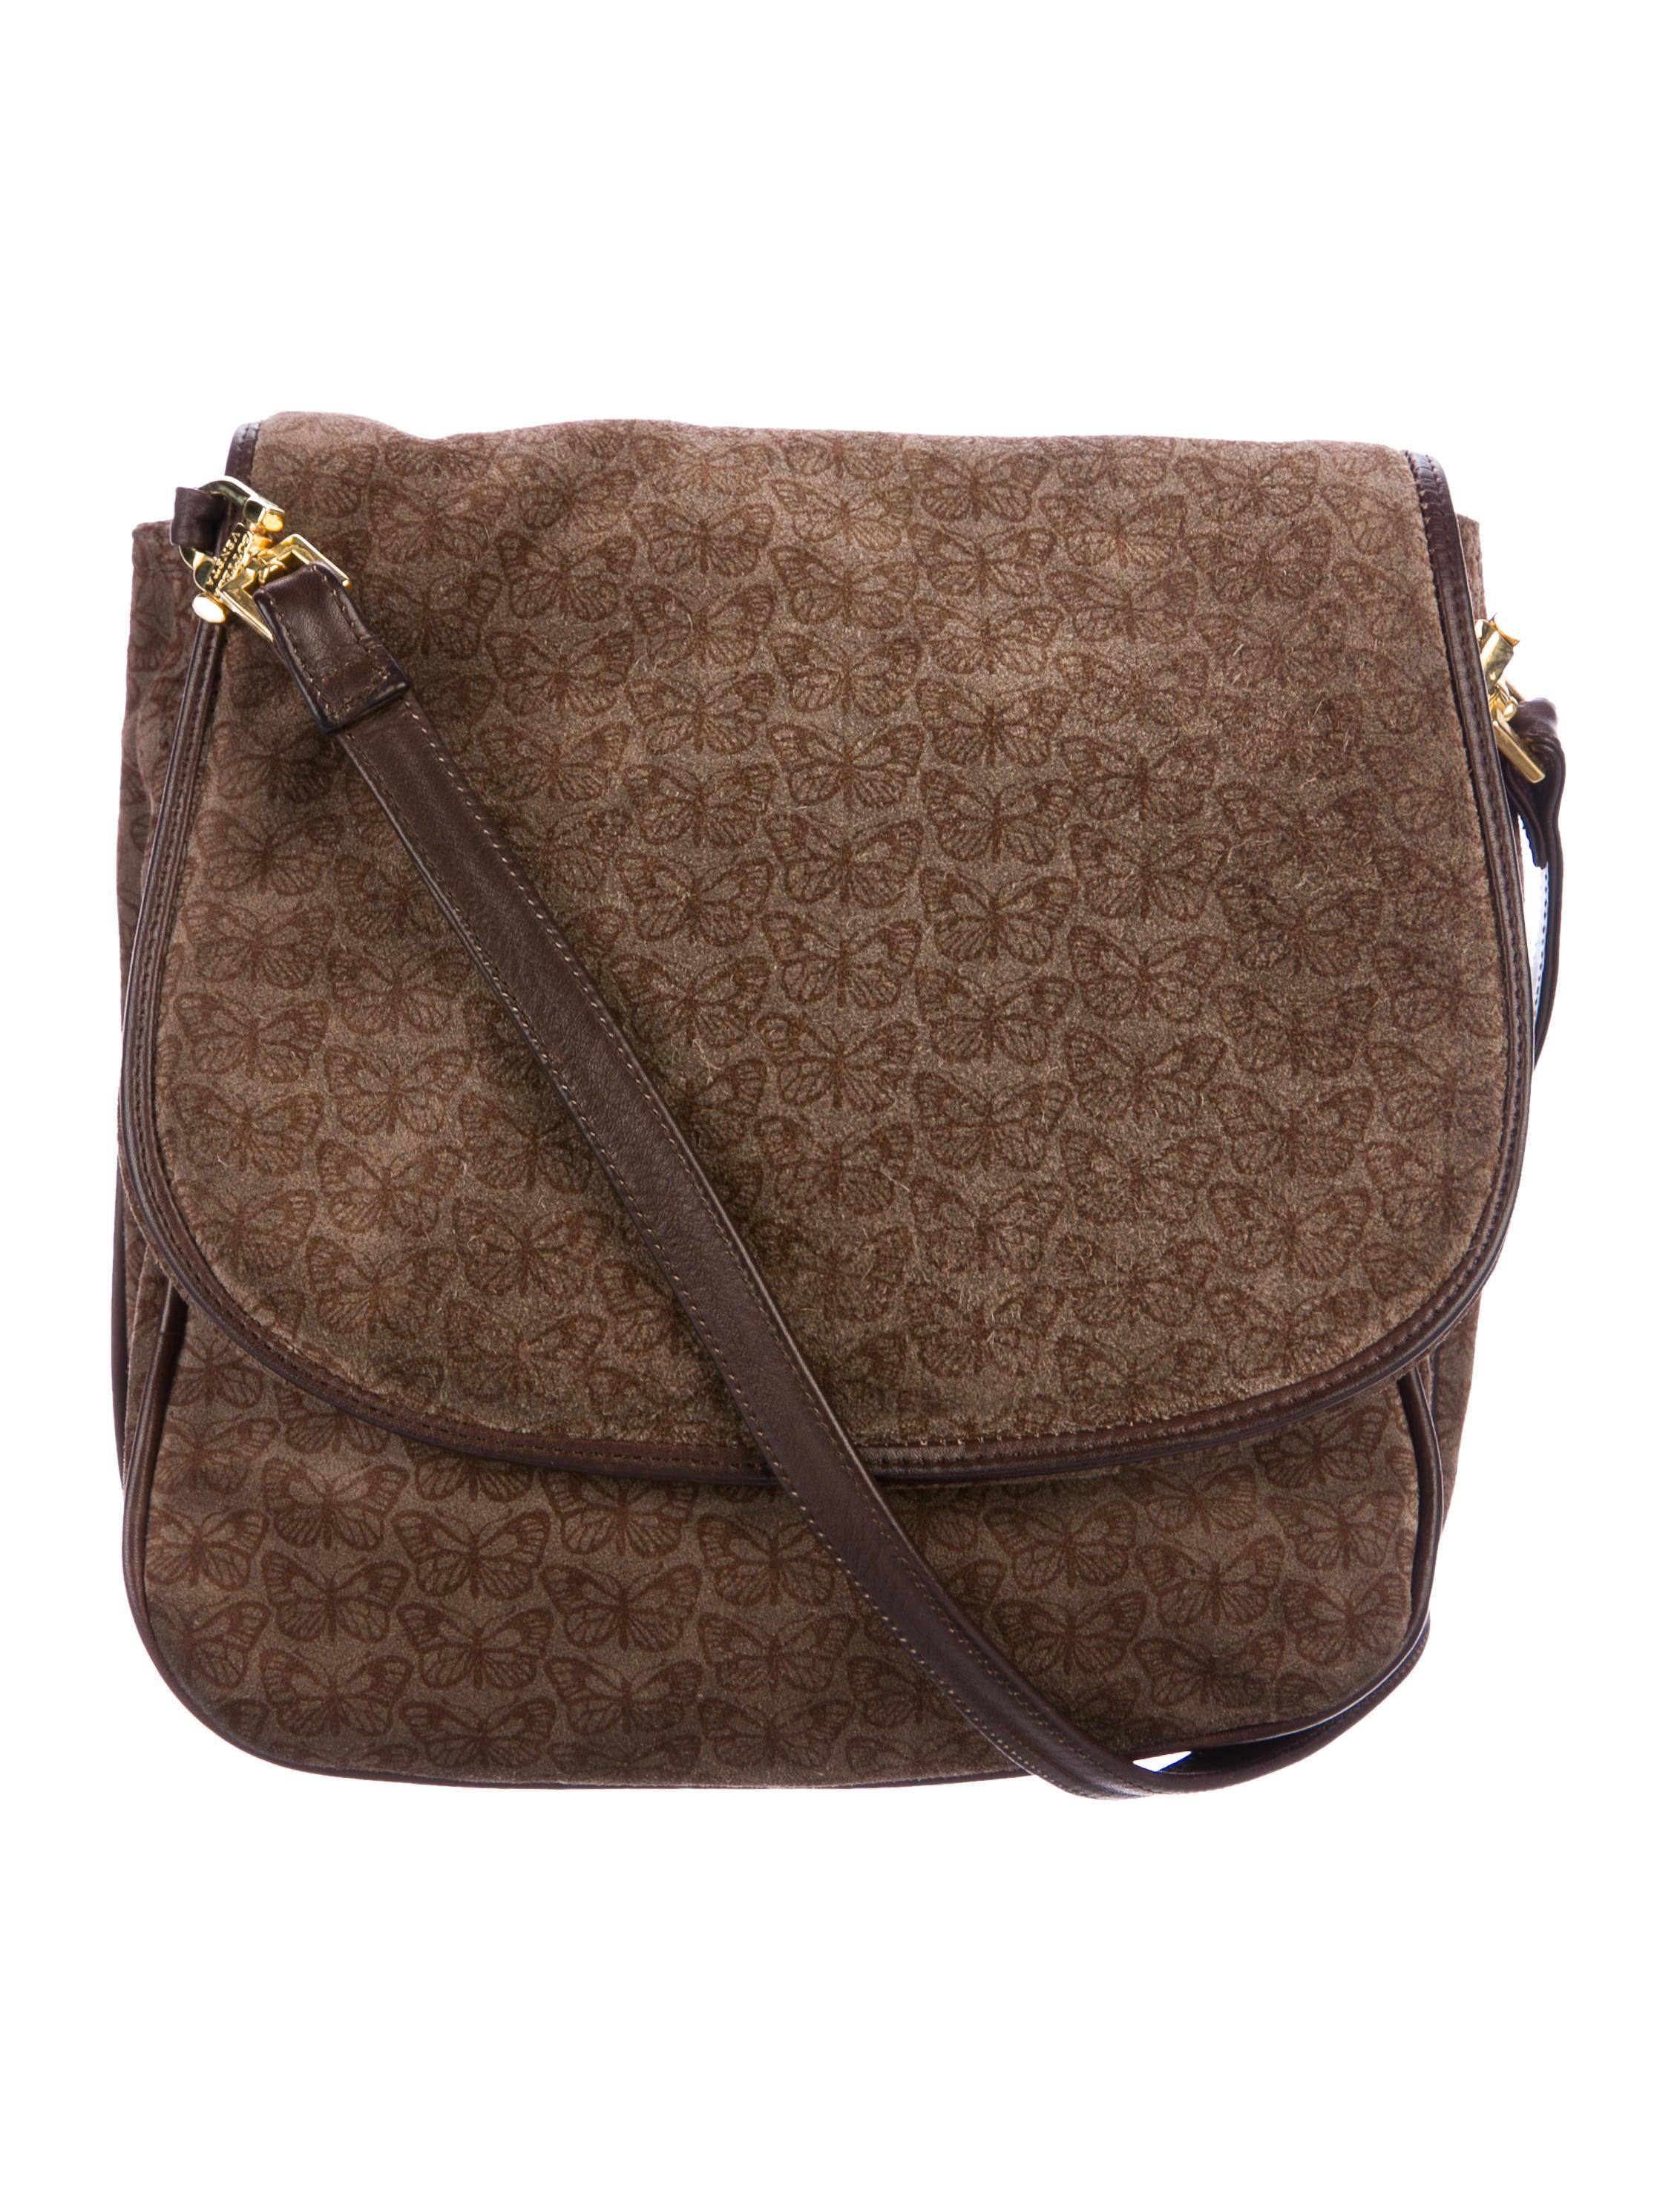 e22f2e9d7ccc Veneta Butterfly Vintage Bottega Crossbody Bag d18Uxqw